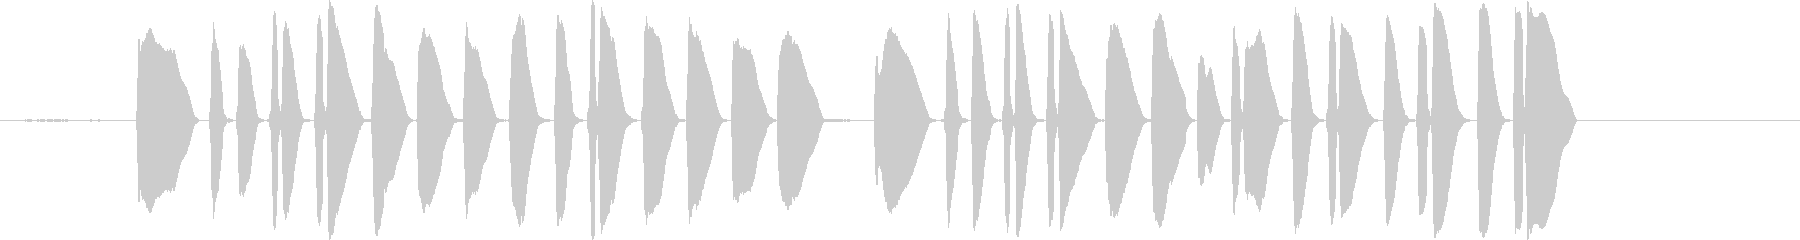 Bugle PlaysΓÇÿtat...の未再生の波形